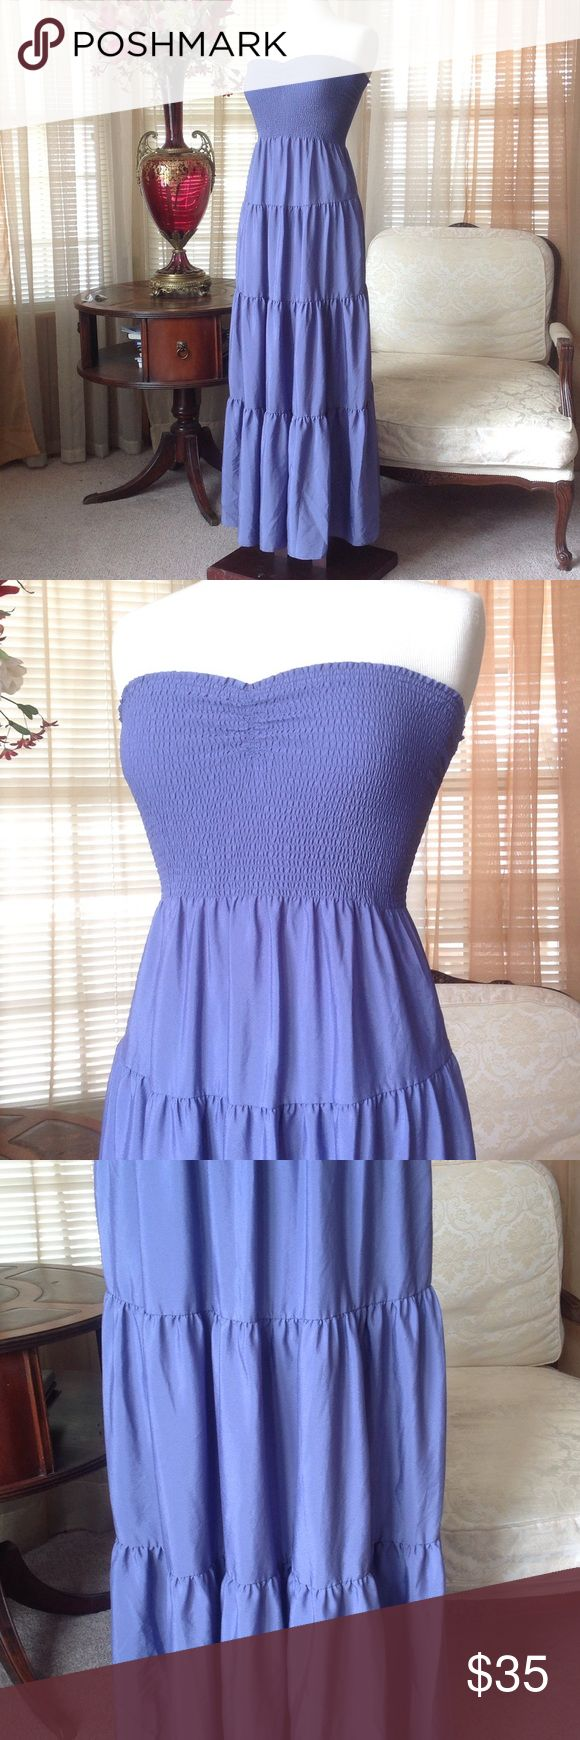 "Moda international purple maxi dress No signs of wear. It's 50.5"" long measuring on the mannequin.                                 d Moda International Dresses Maxi"